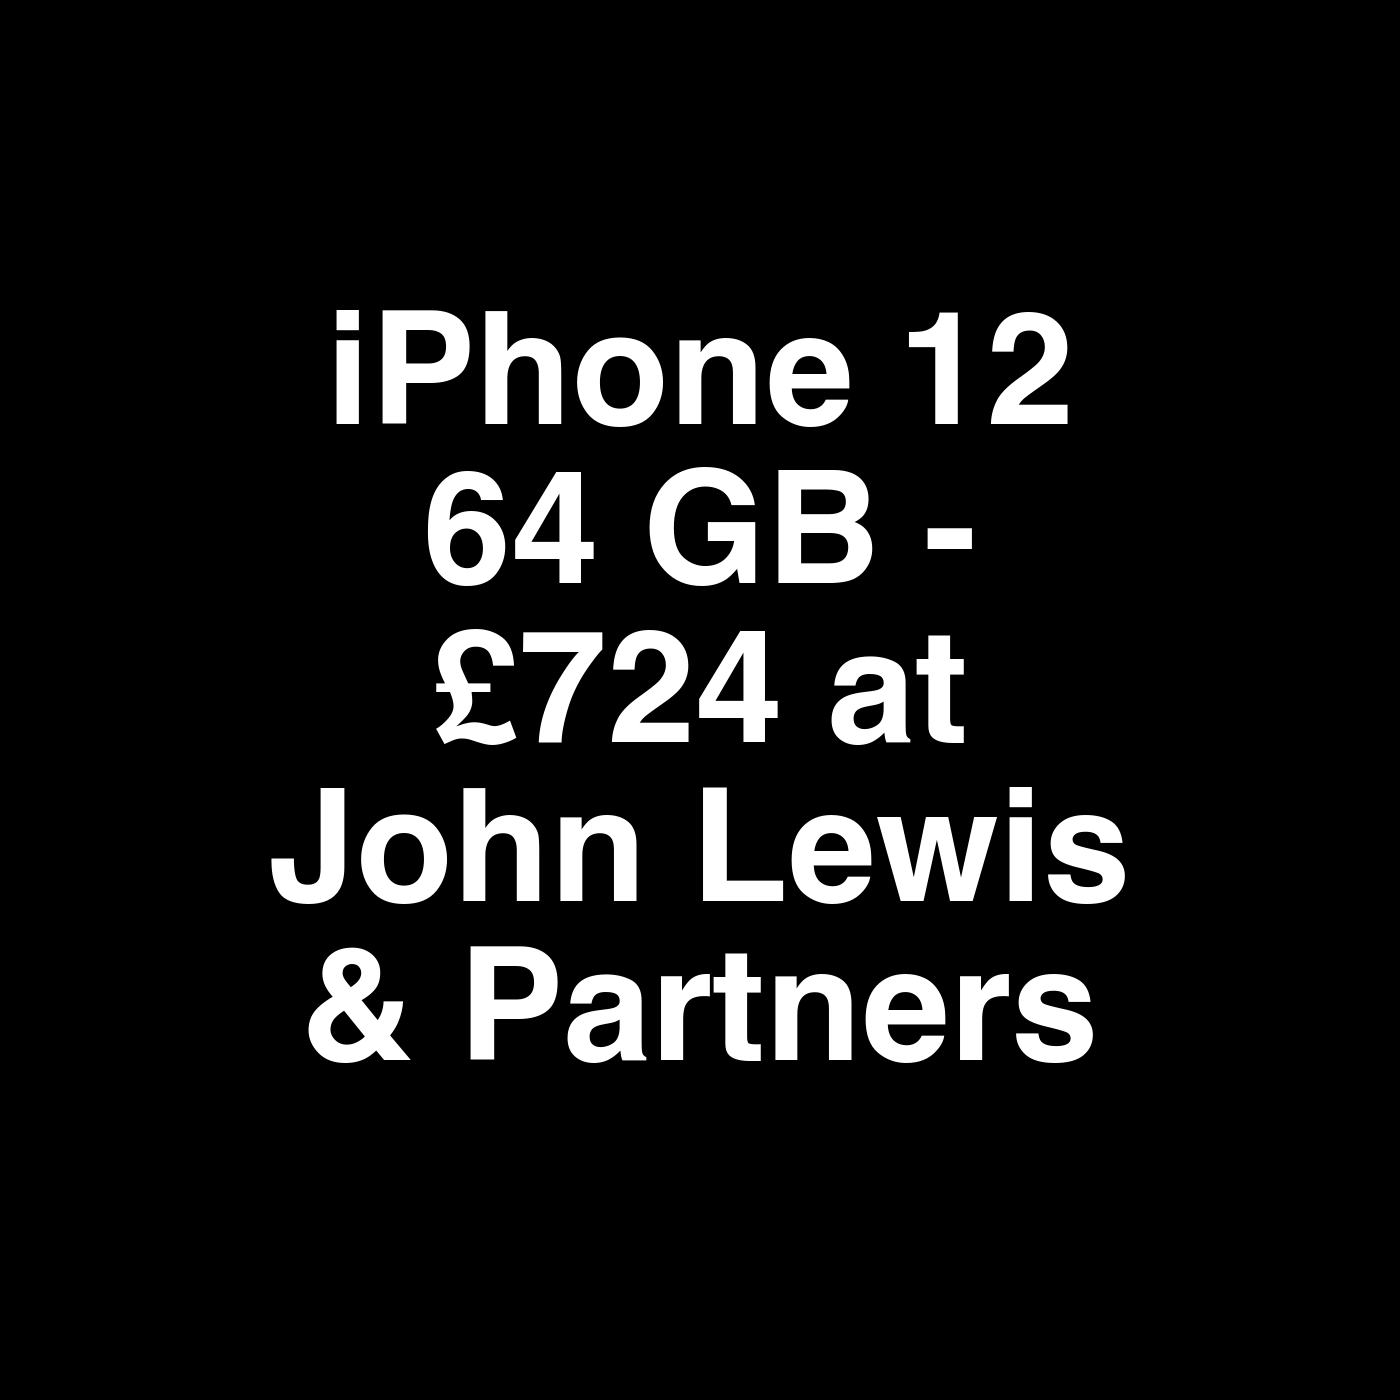 iPhone 12 64 GB - £724 at John Lewis & Partners in 2021 | John lewis &  partners, John lewis, Lewis